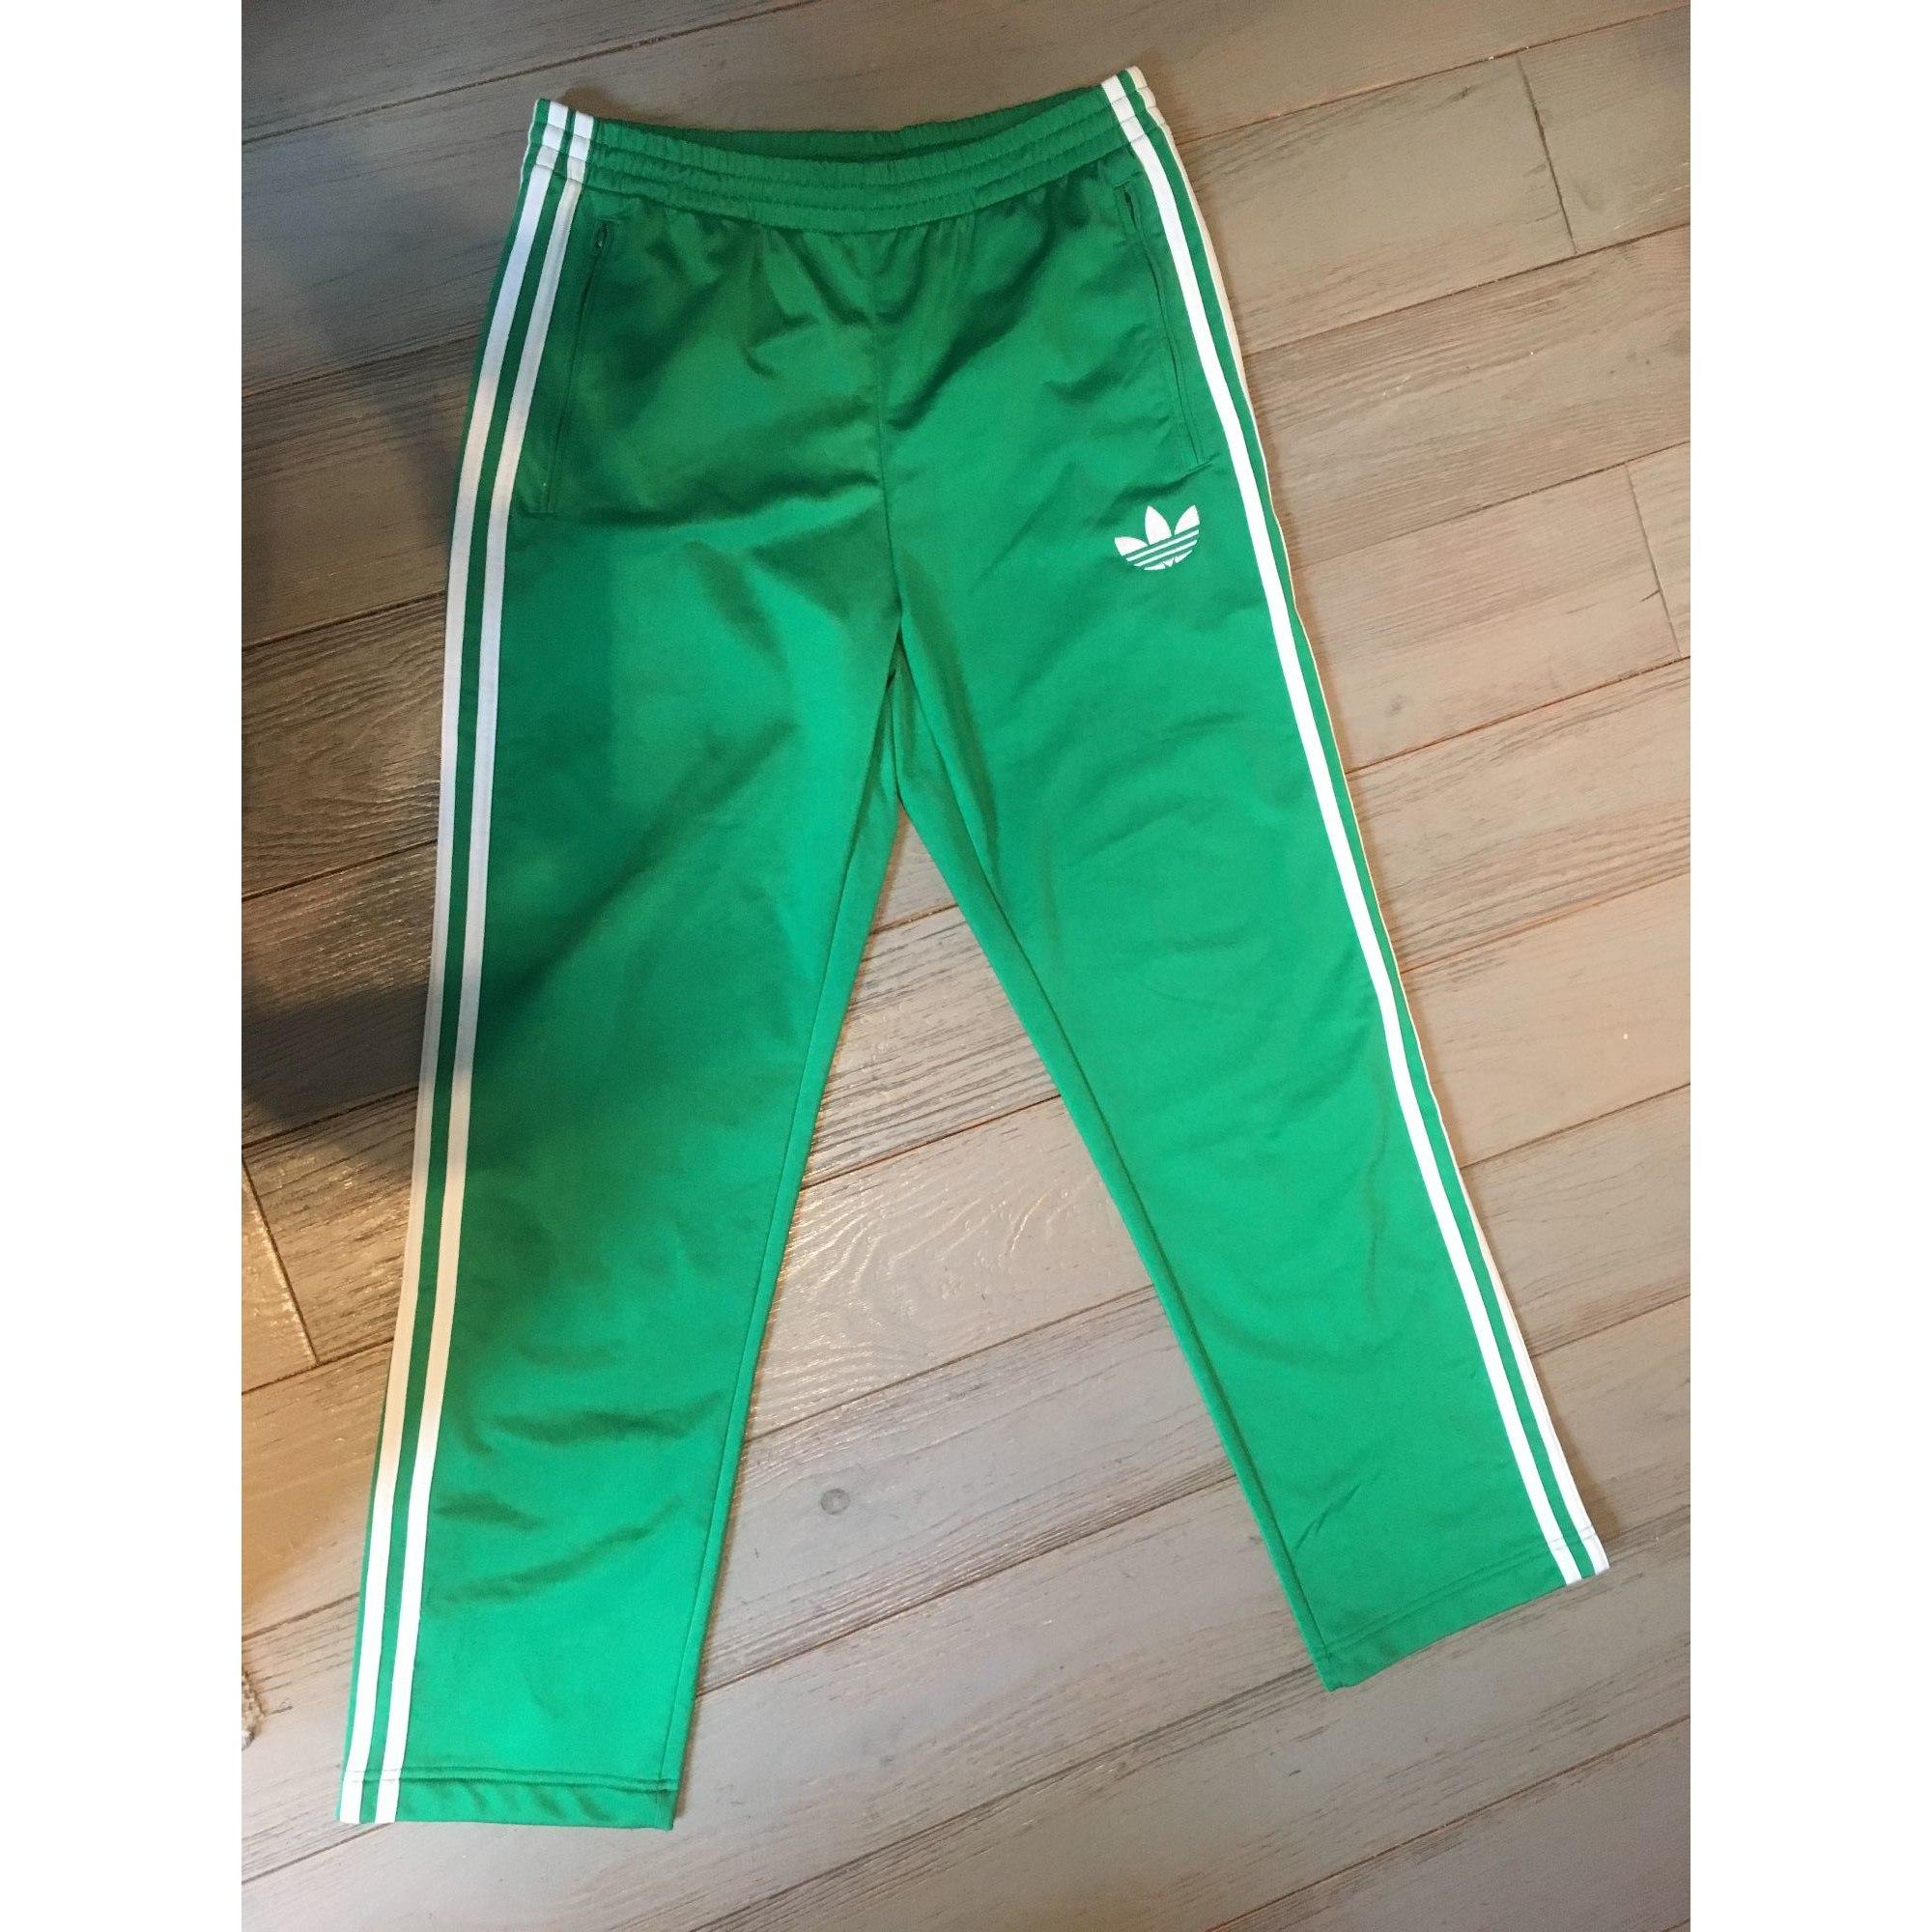 3c35997b3e7 survetement adidas vert